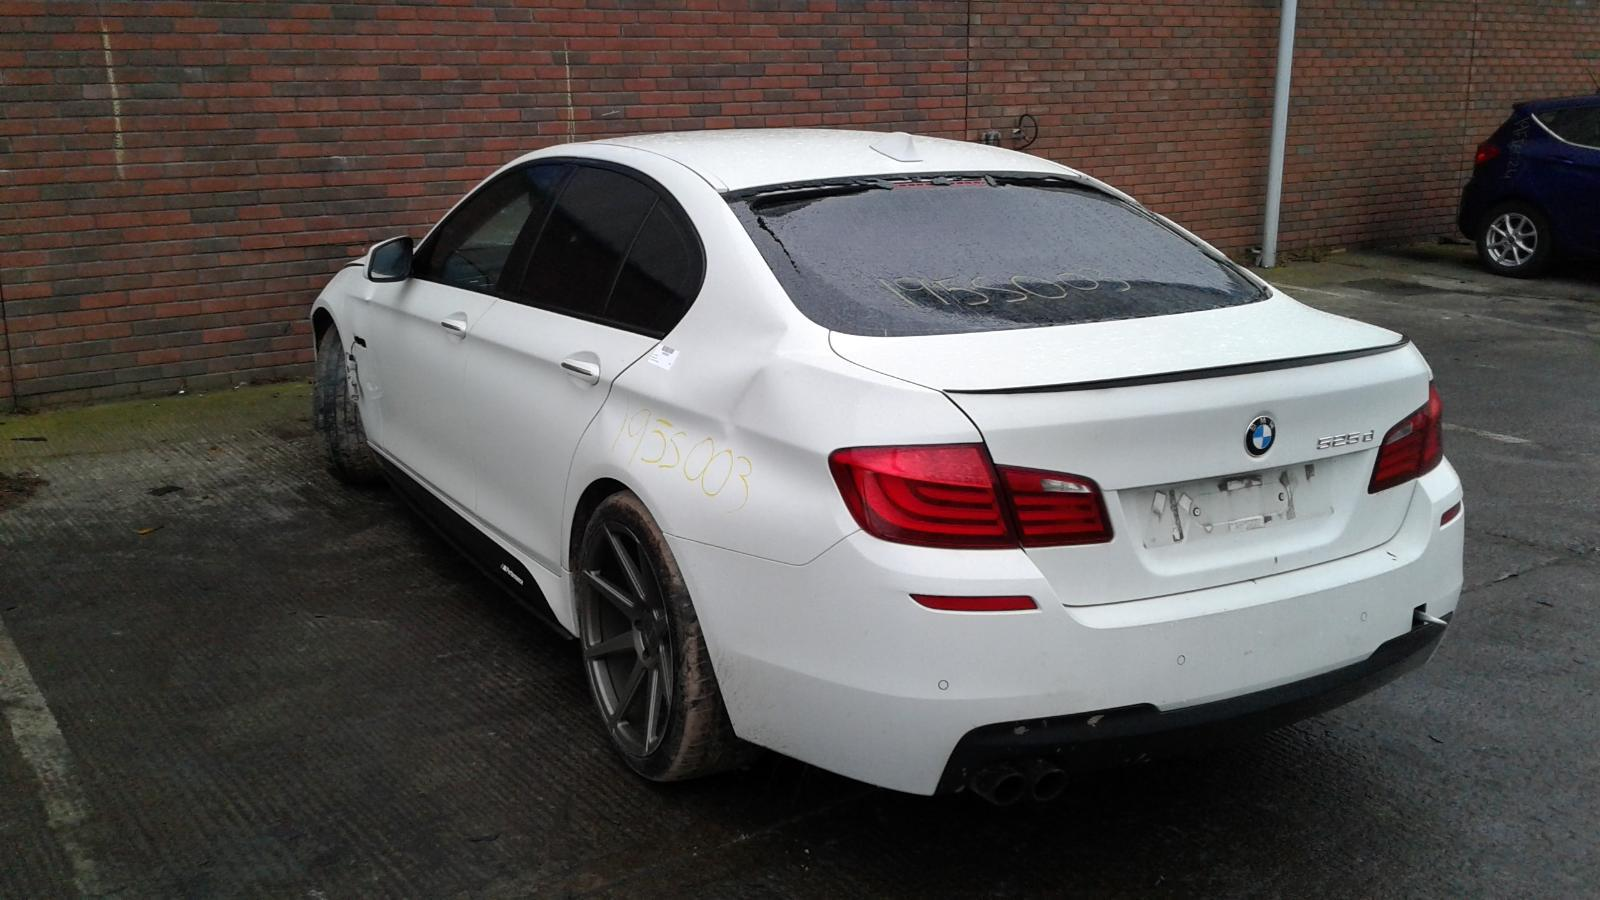 2011 BMW 5 SERIES Image